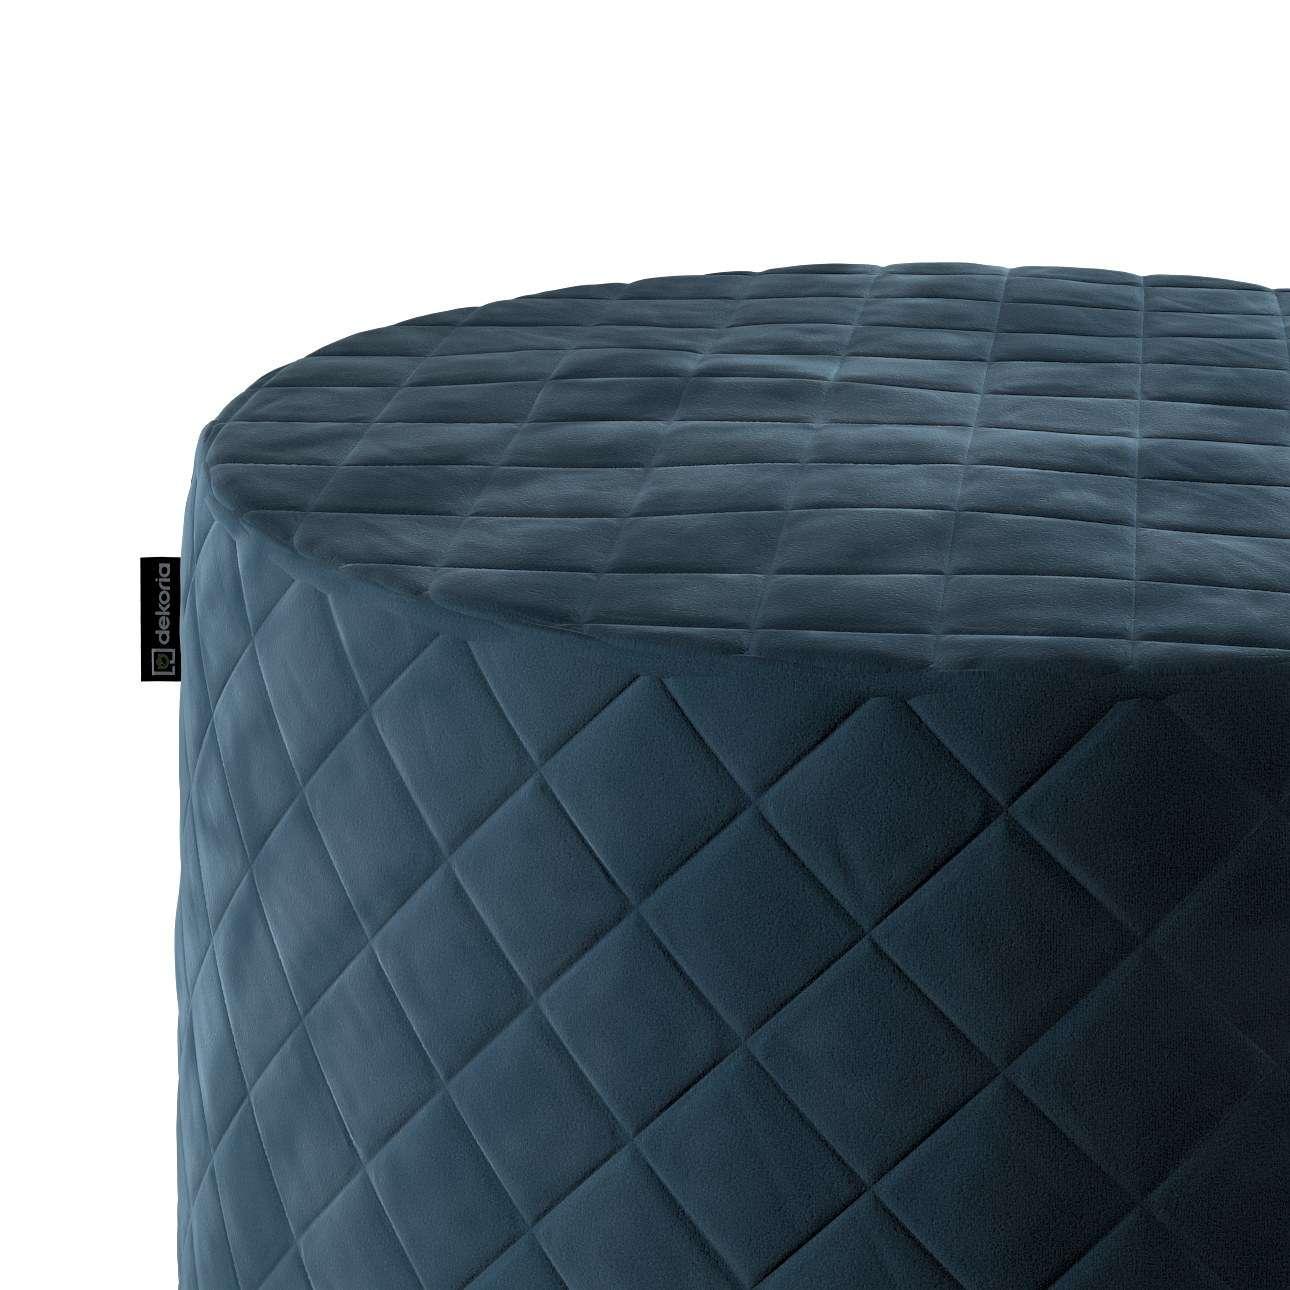 Puf Barrel pikowany w kolekcji Velvet, tkanina: 704-16